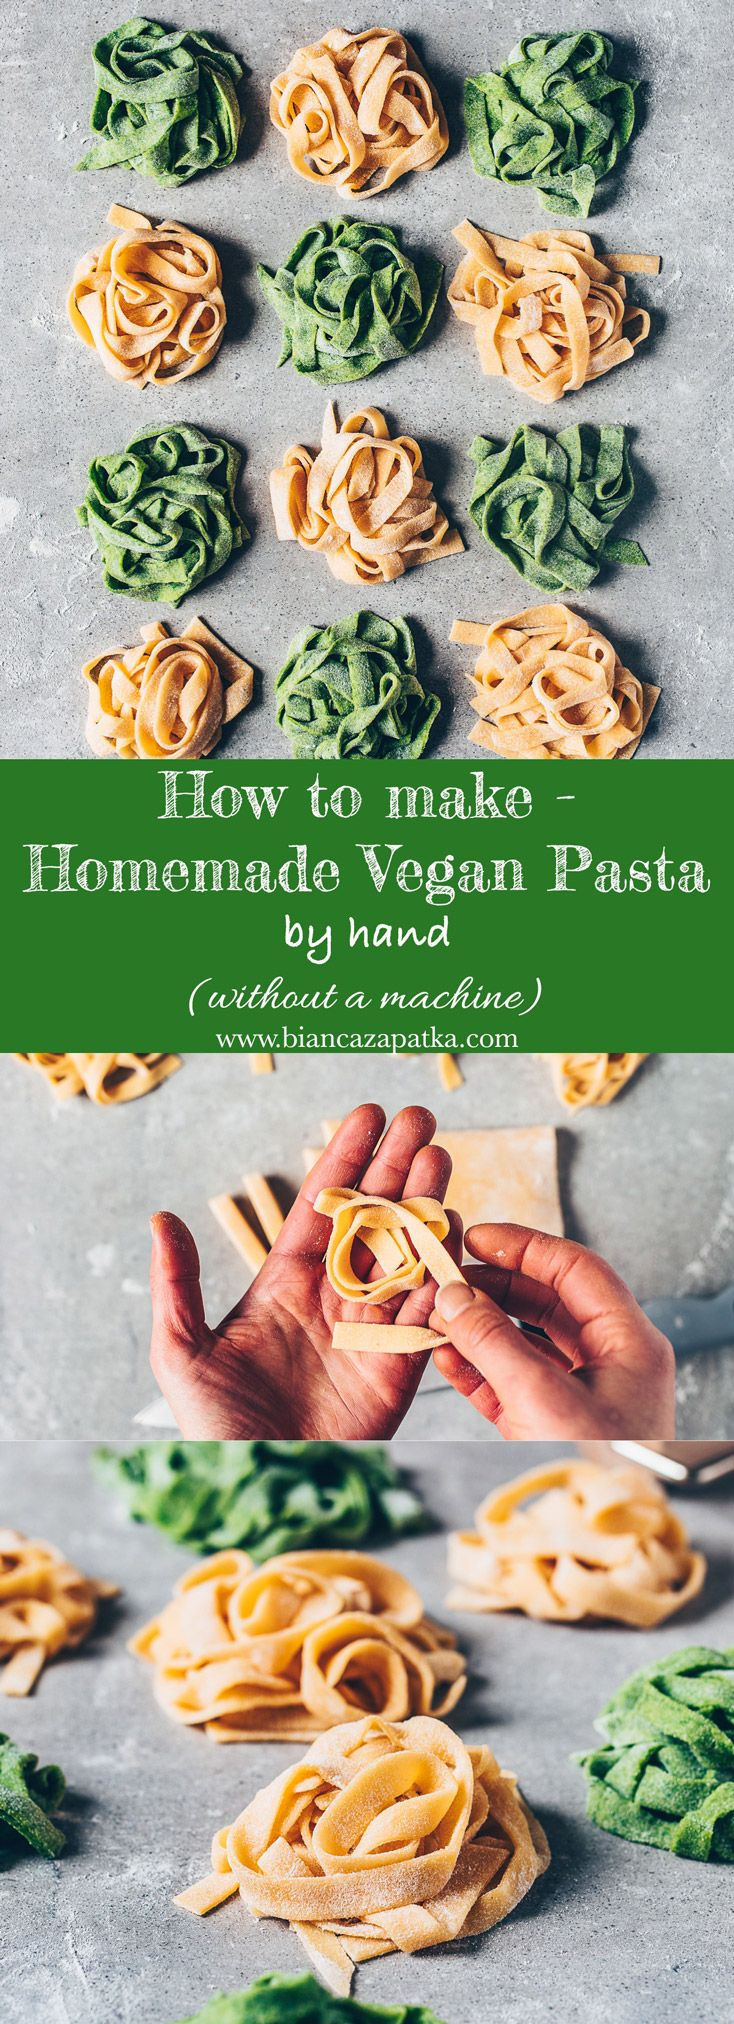 Photo of Homemade Vegan Pasta Recipe (Eggless Pasta Dough) – Bianca Zapatka   Recipes